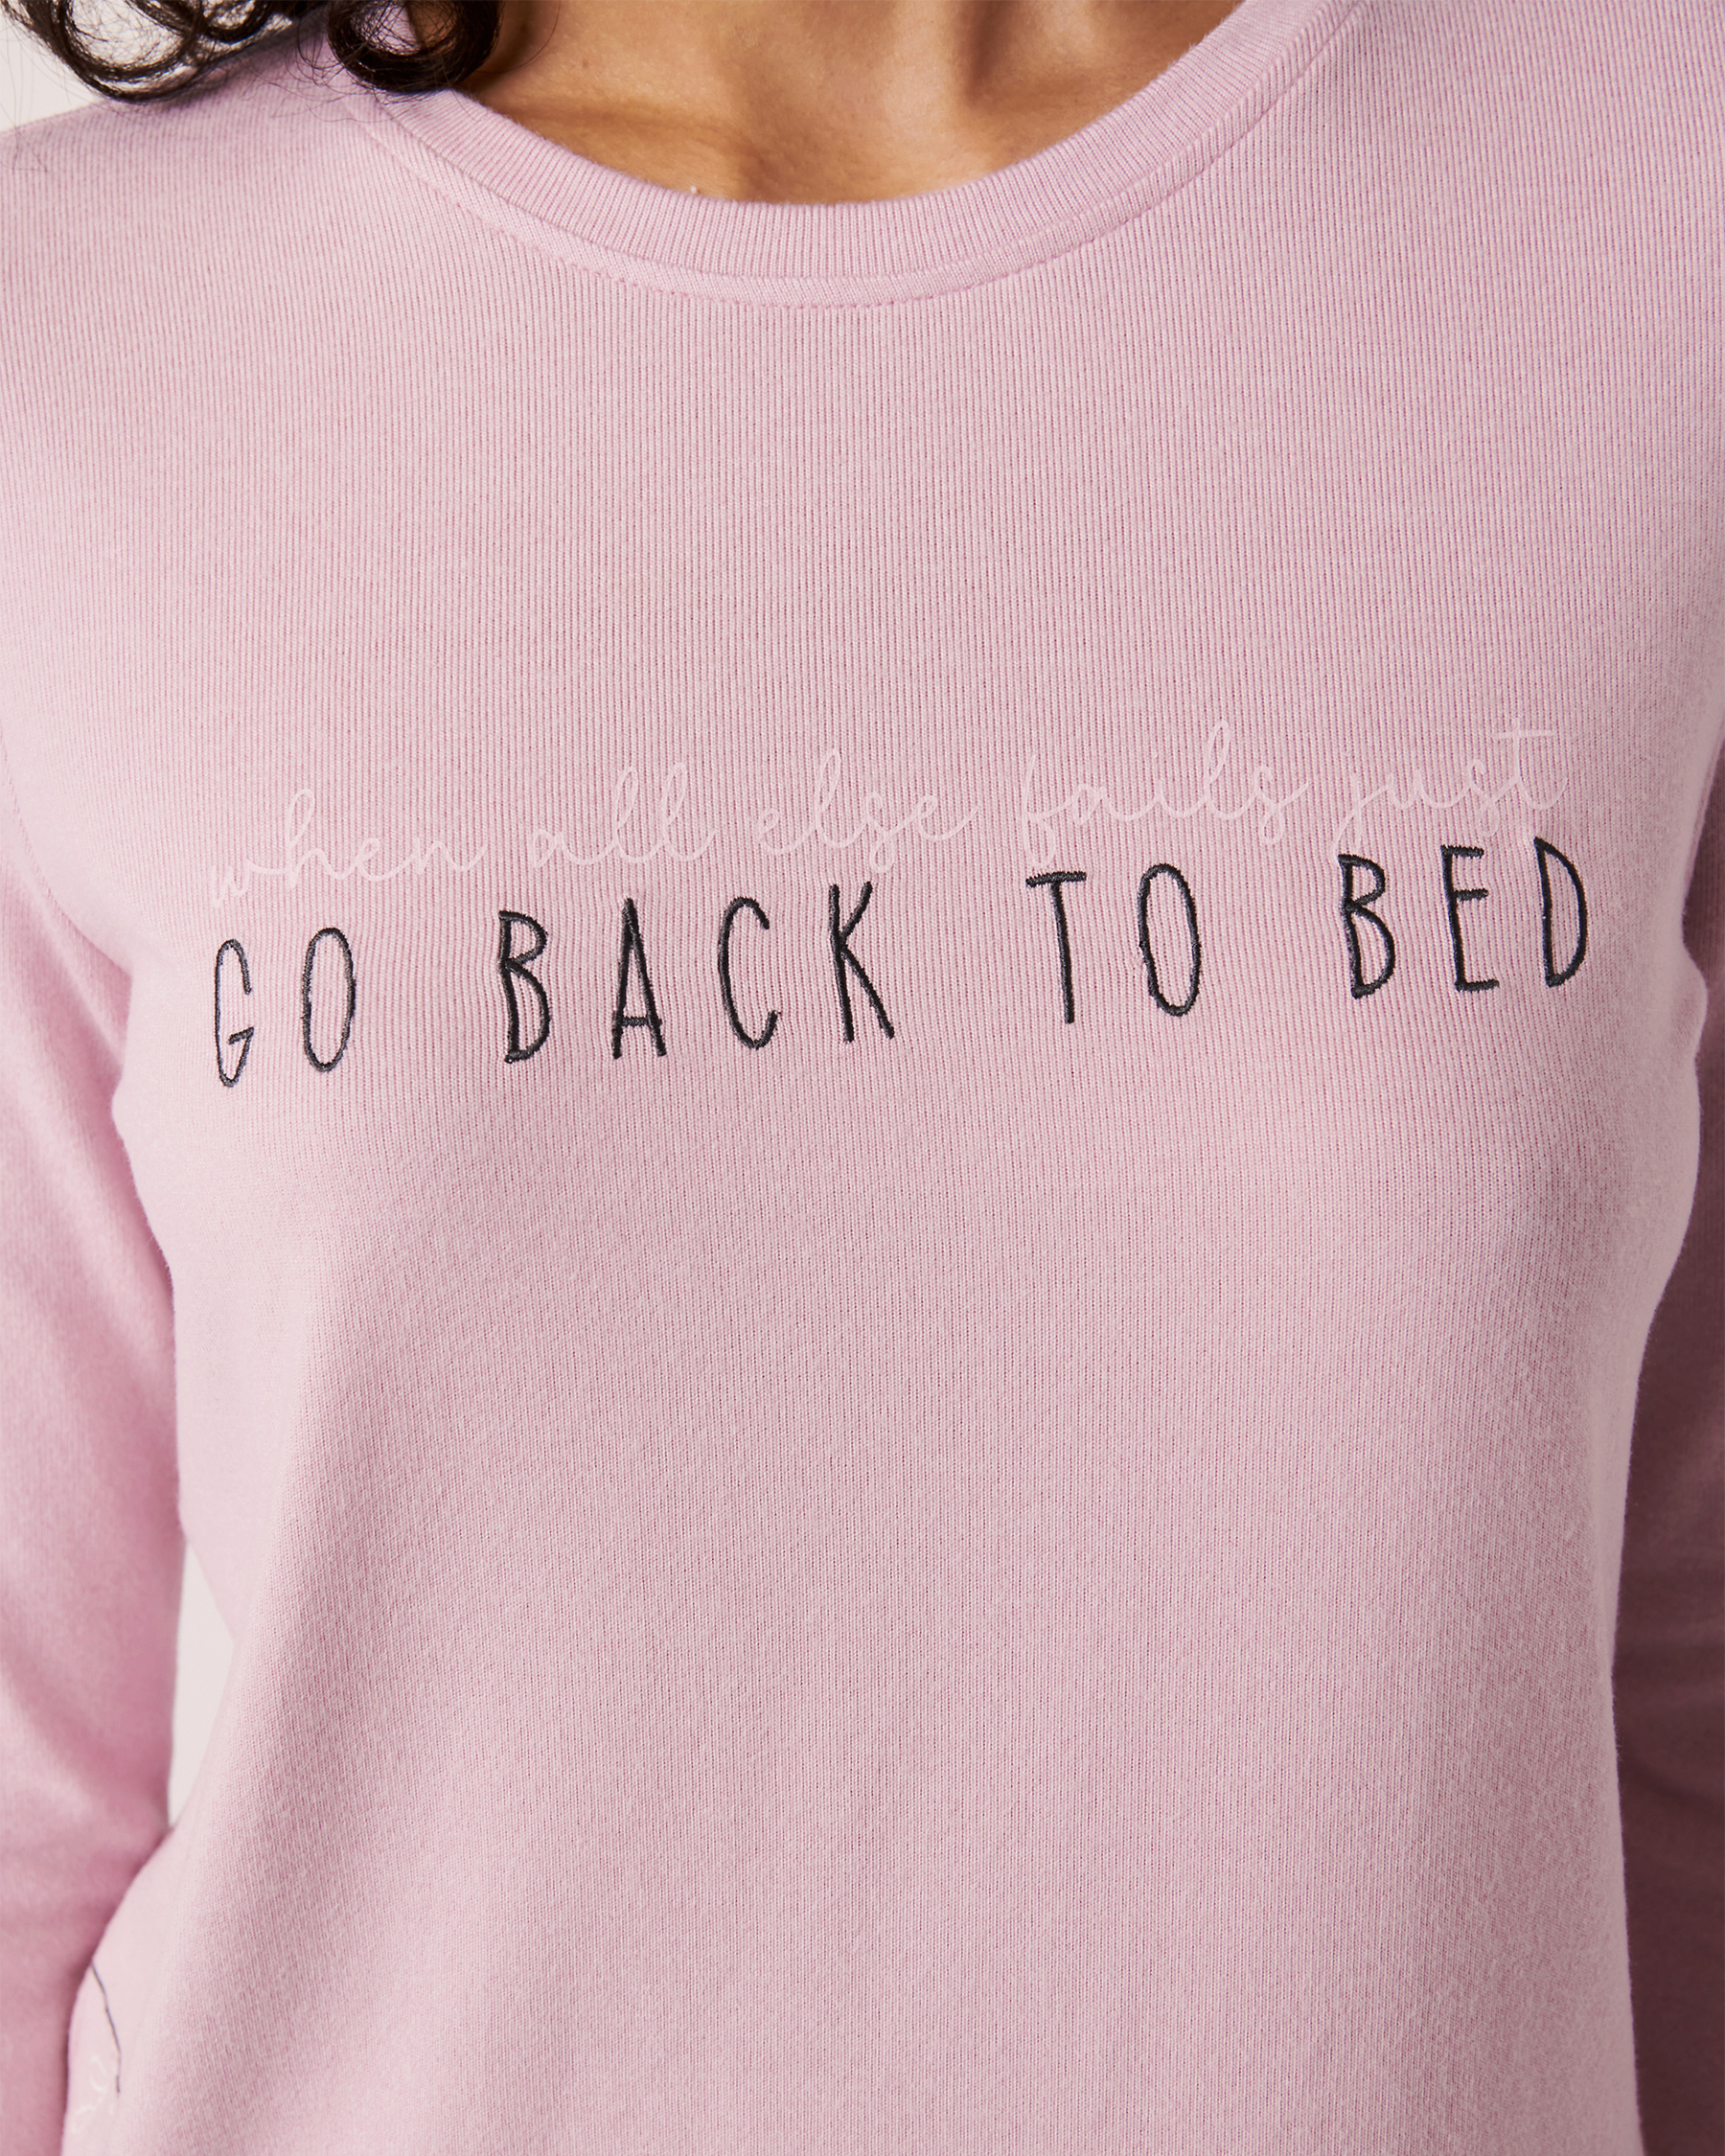 LA VIE EN ROSE Recycled Fibers Long Sleeve Shirt Light pink mix 40100142 - View2